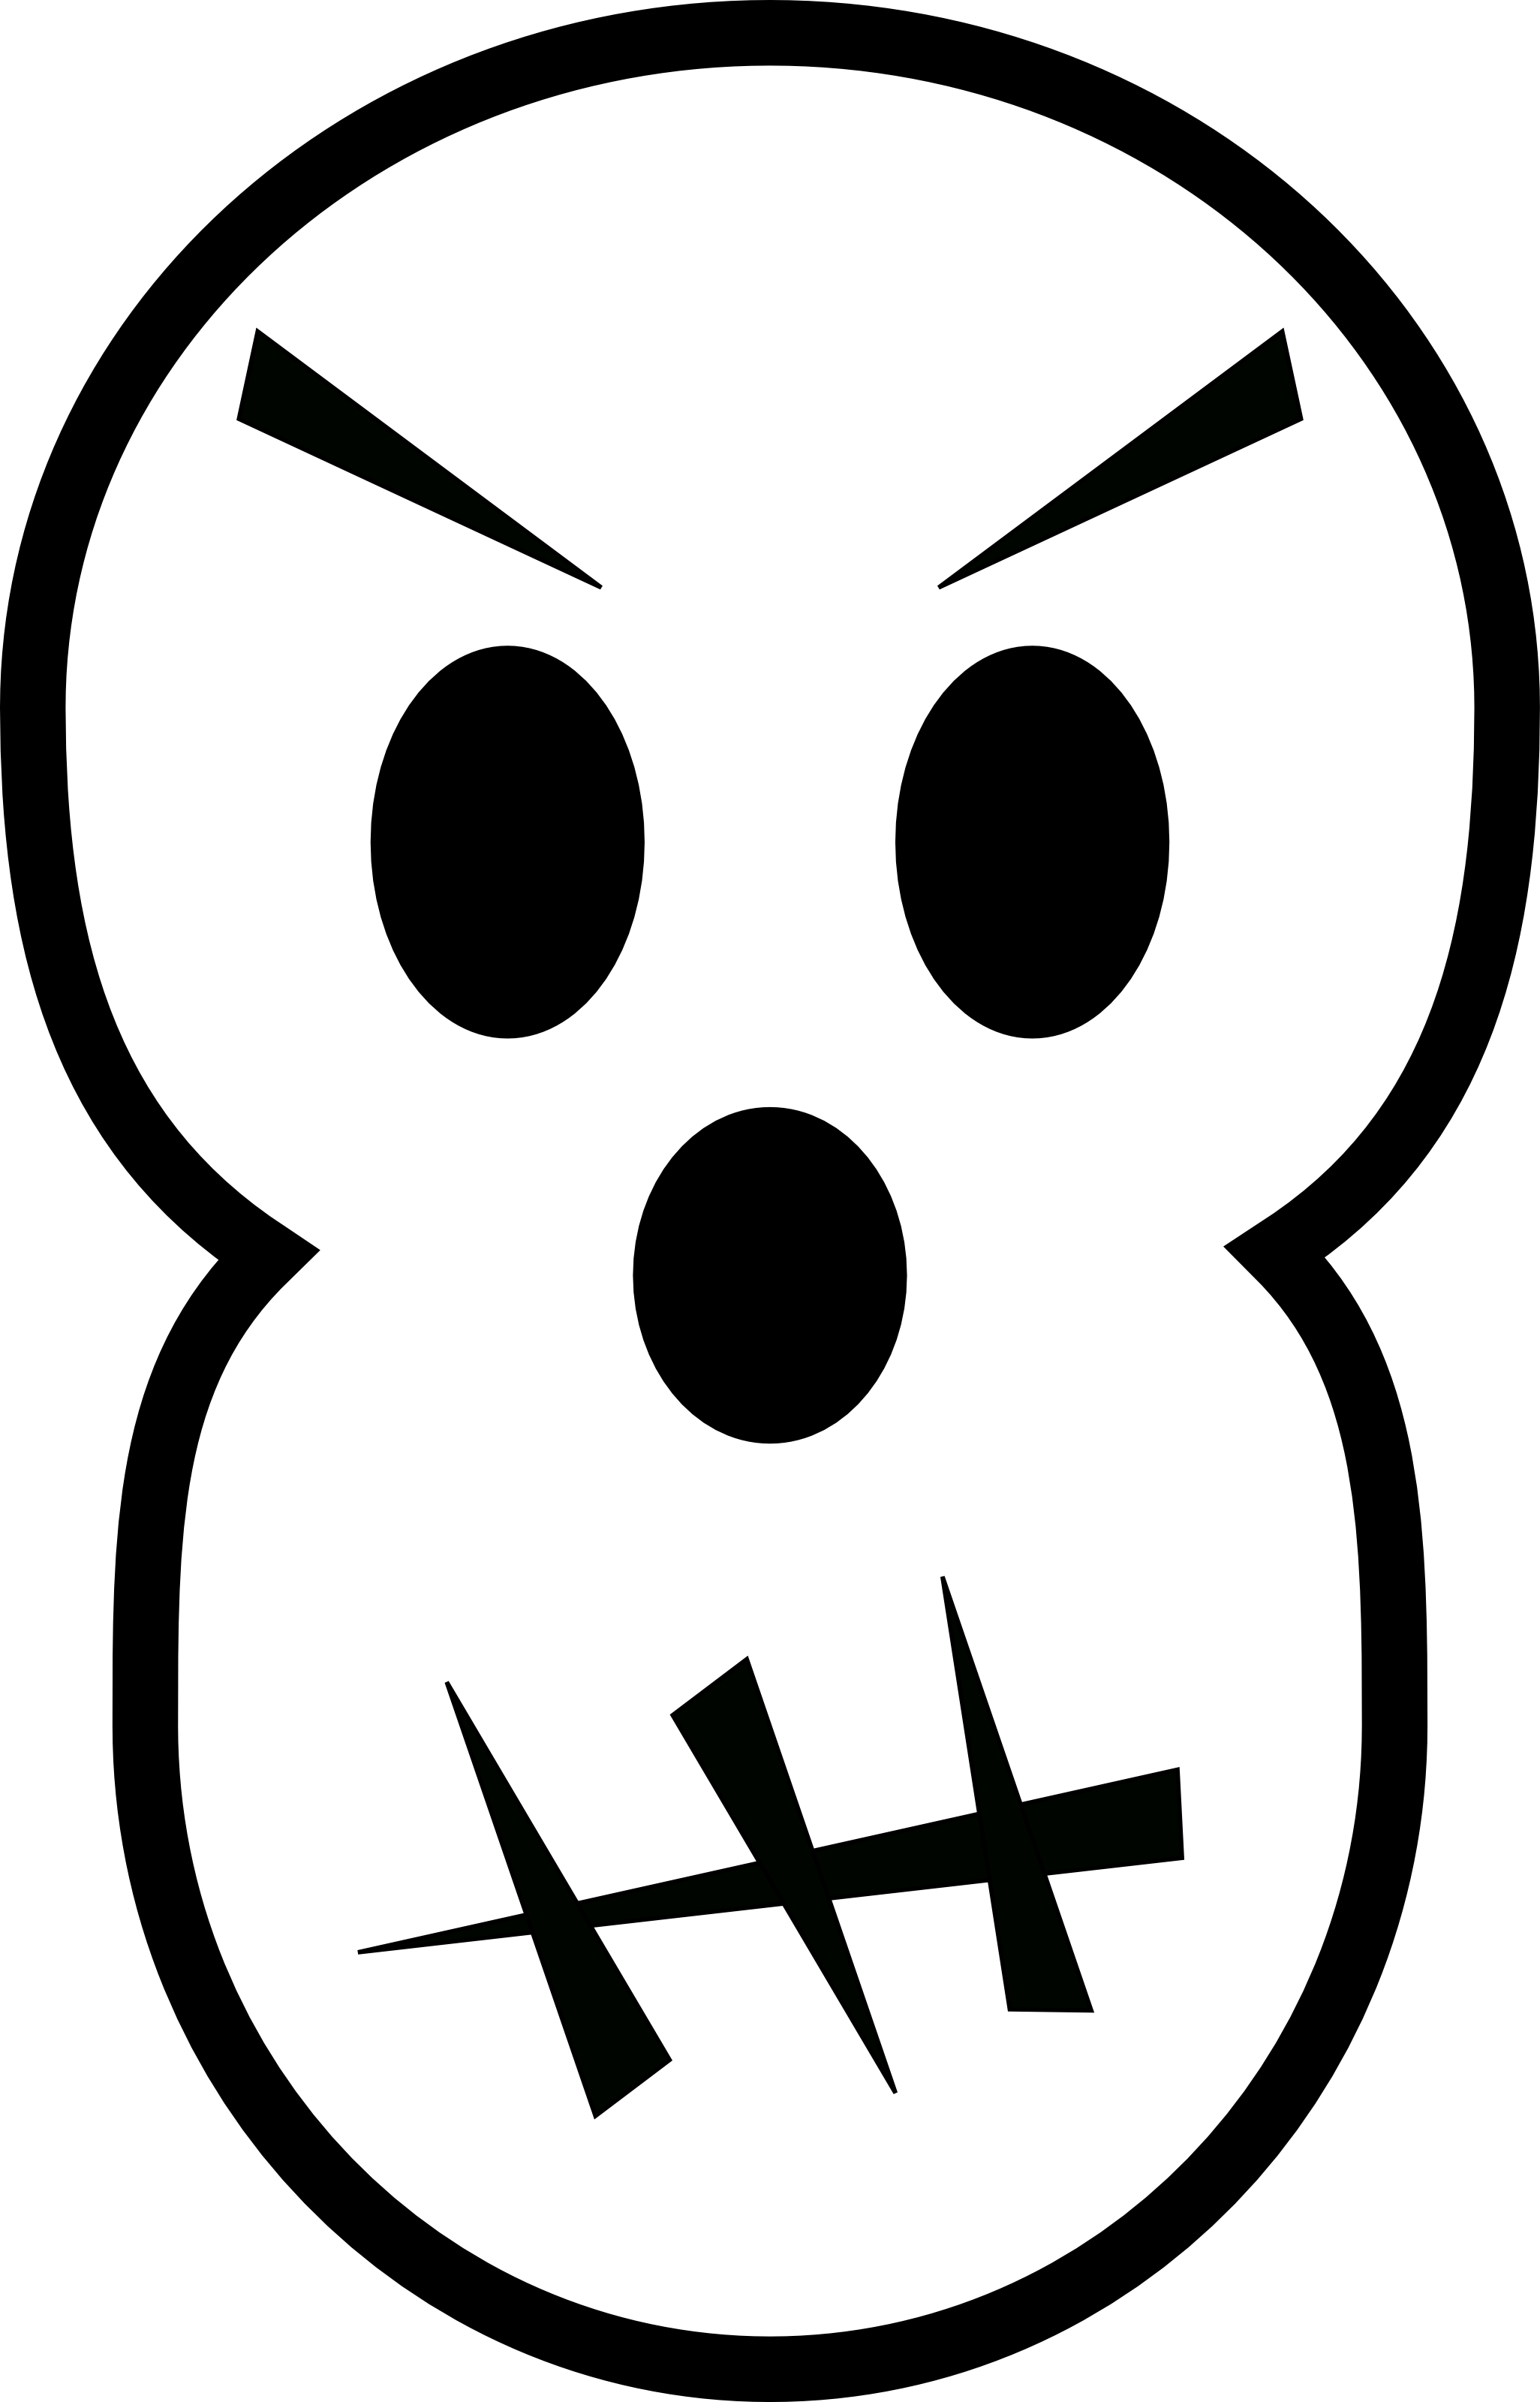 black and white angry skull free halloween vector Headless Horseman SVG headless horseman clip art png